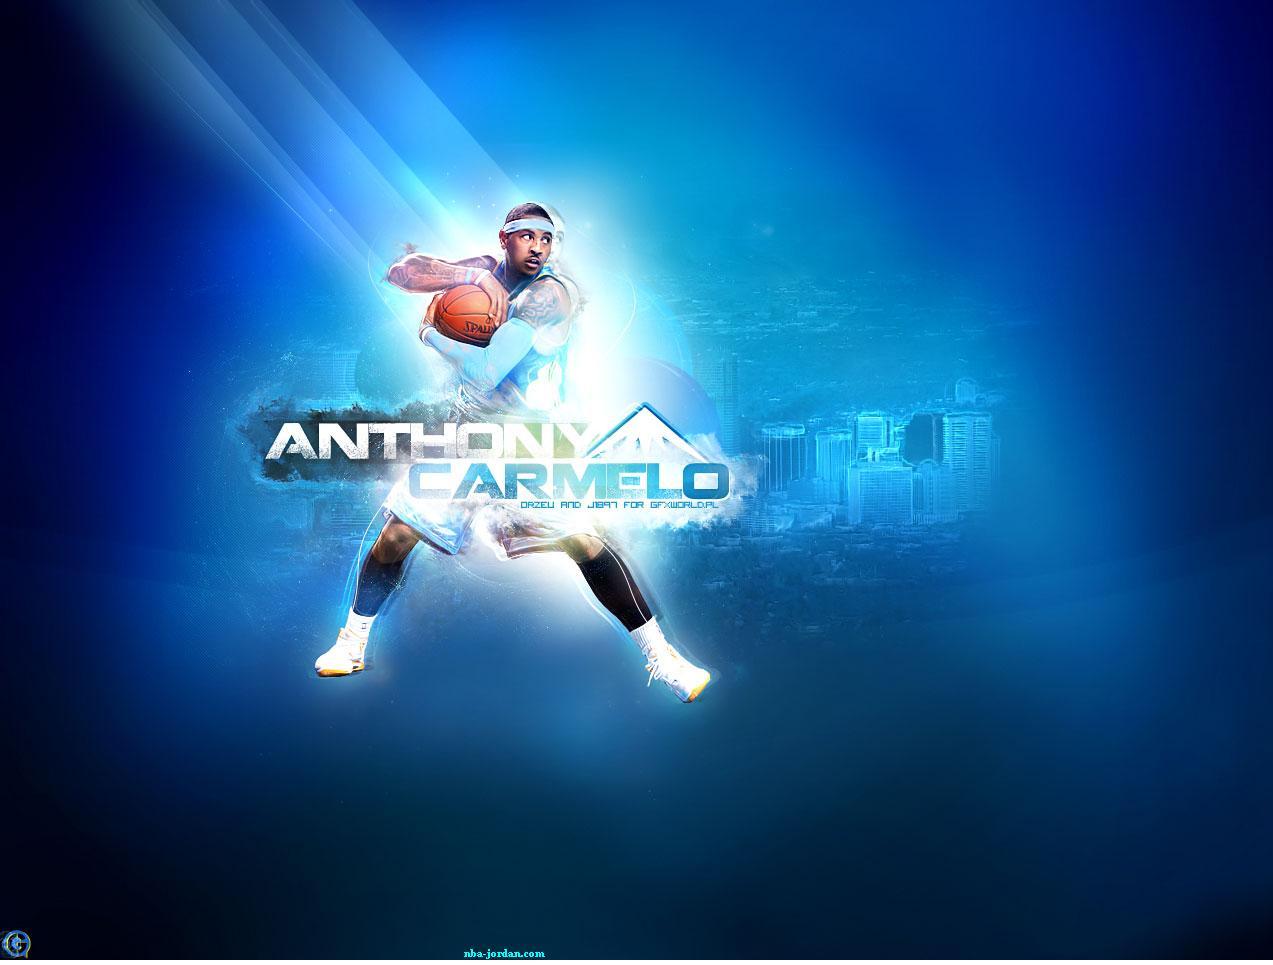 http://3.bp.blogspot.com/-zFdLVRqeBGE/Tgd6vxP_PRI/AAAAAAAAAs8/kV0OiG943yw/s1600/Carmelo-Anthony-Wallpaper.jpg